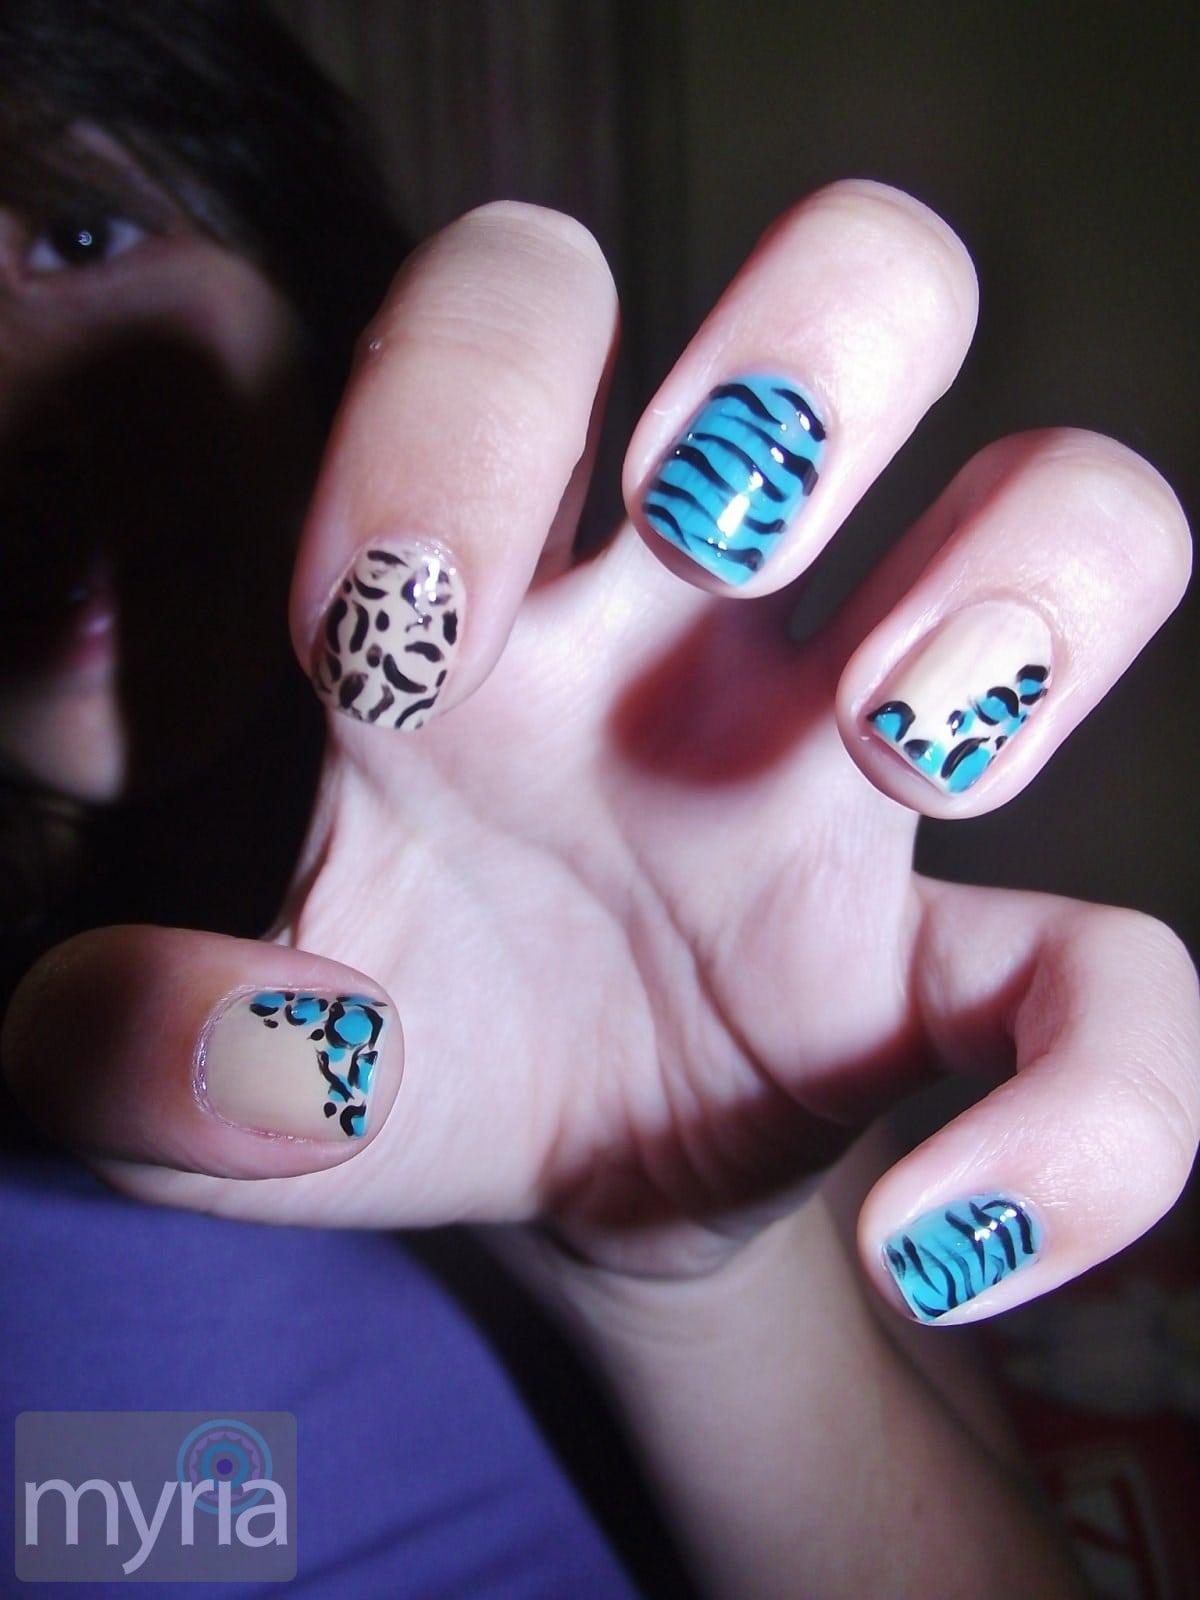 Animal pattern manicure on blue